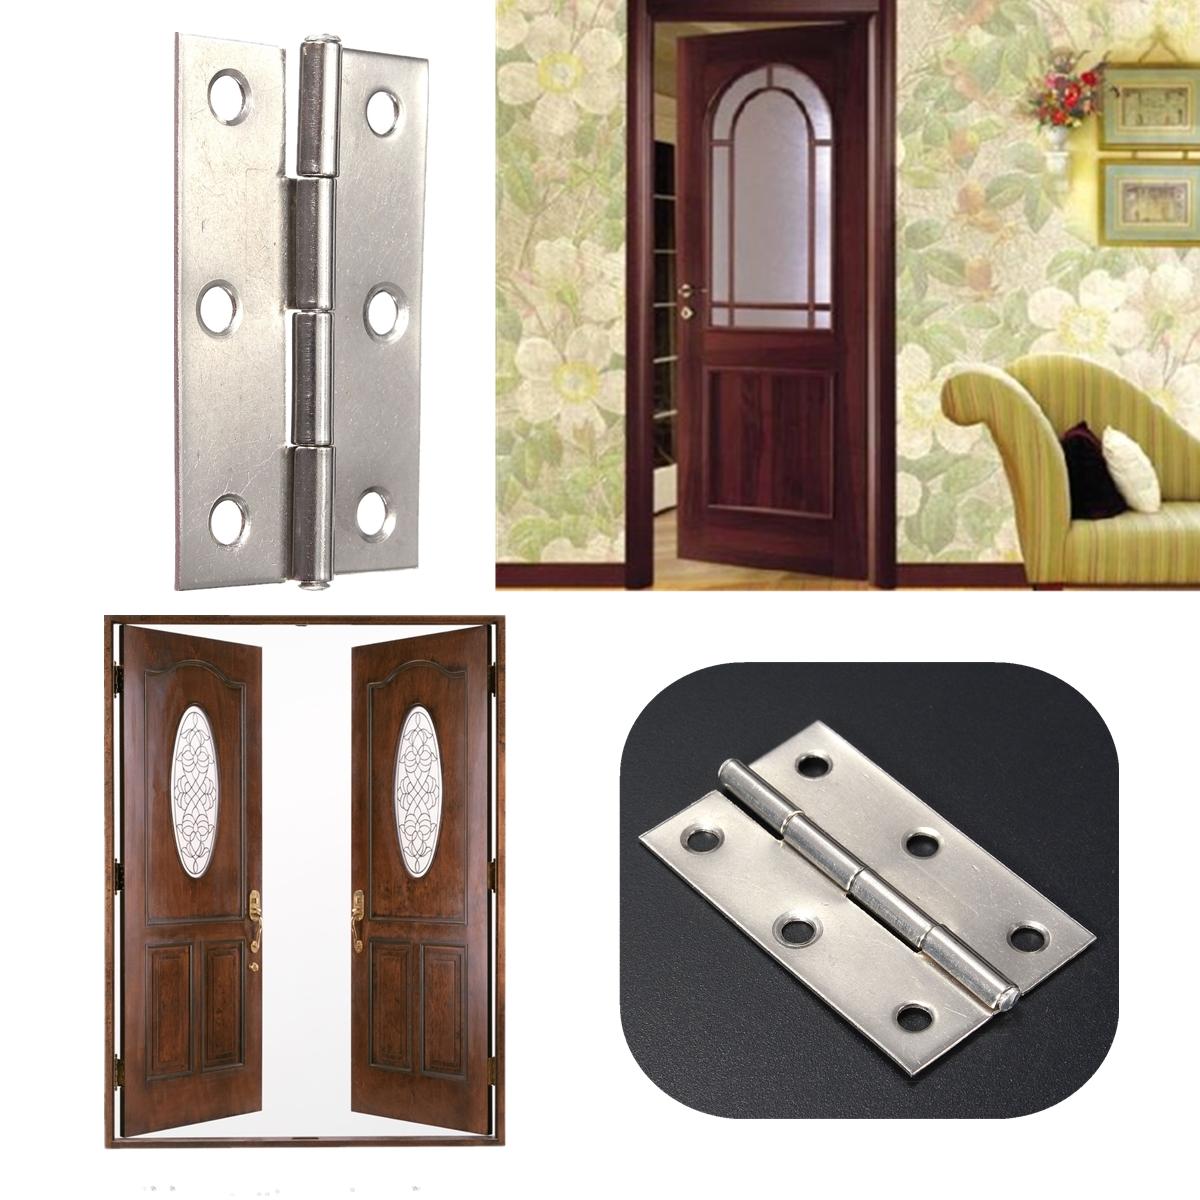 1 5 39 39 2 39 39 2 5 39 39 3 39 39 acier inox charni re hinge pour porte tiroir armoire placard ebay. Black Bedroom Furniture Sets. Home Design Ideas